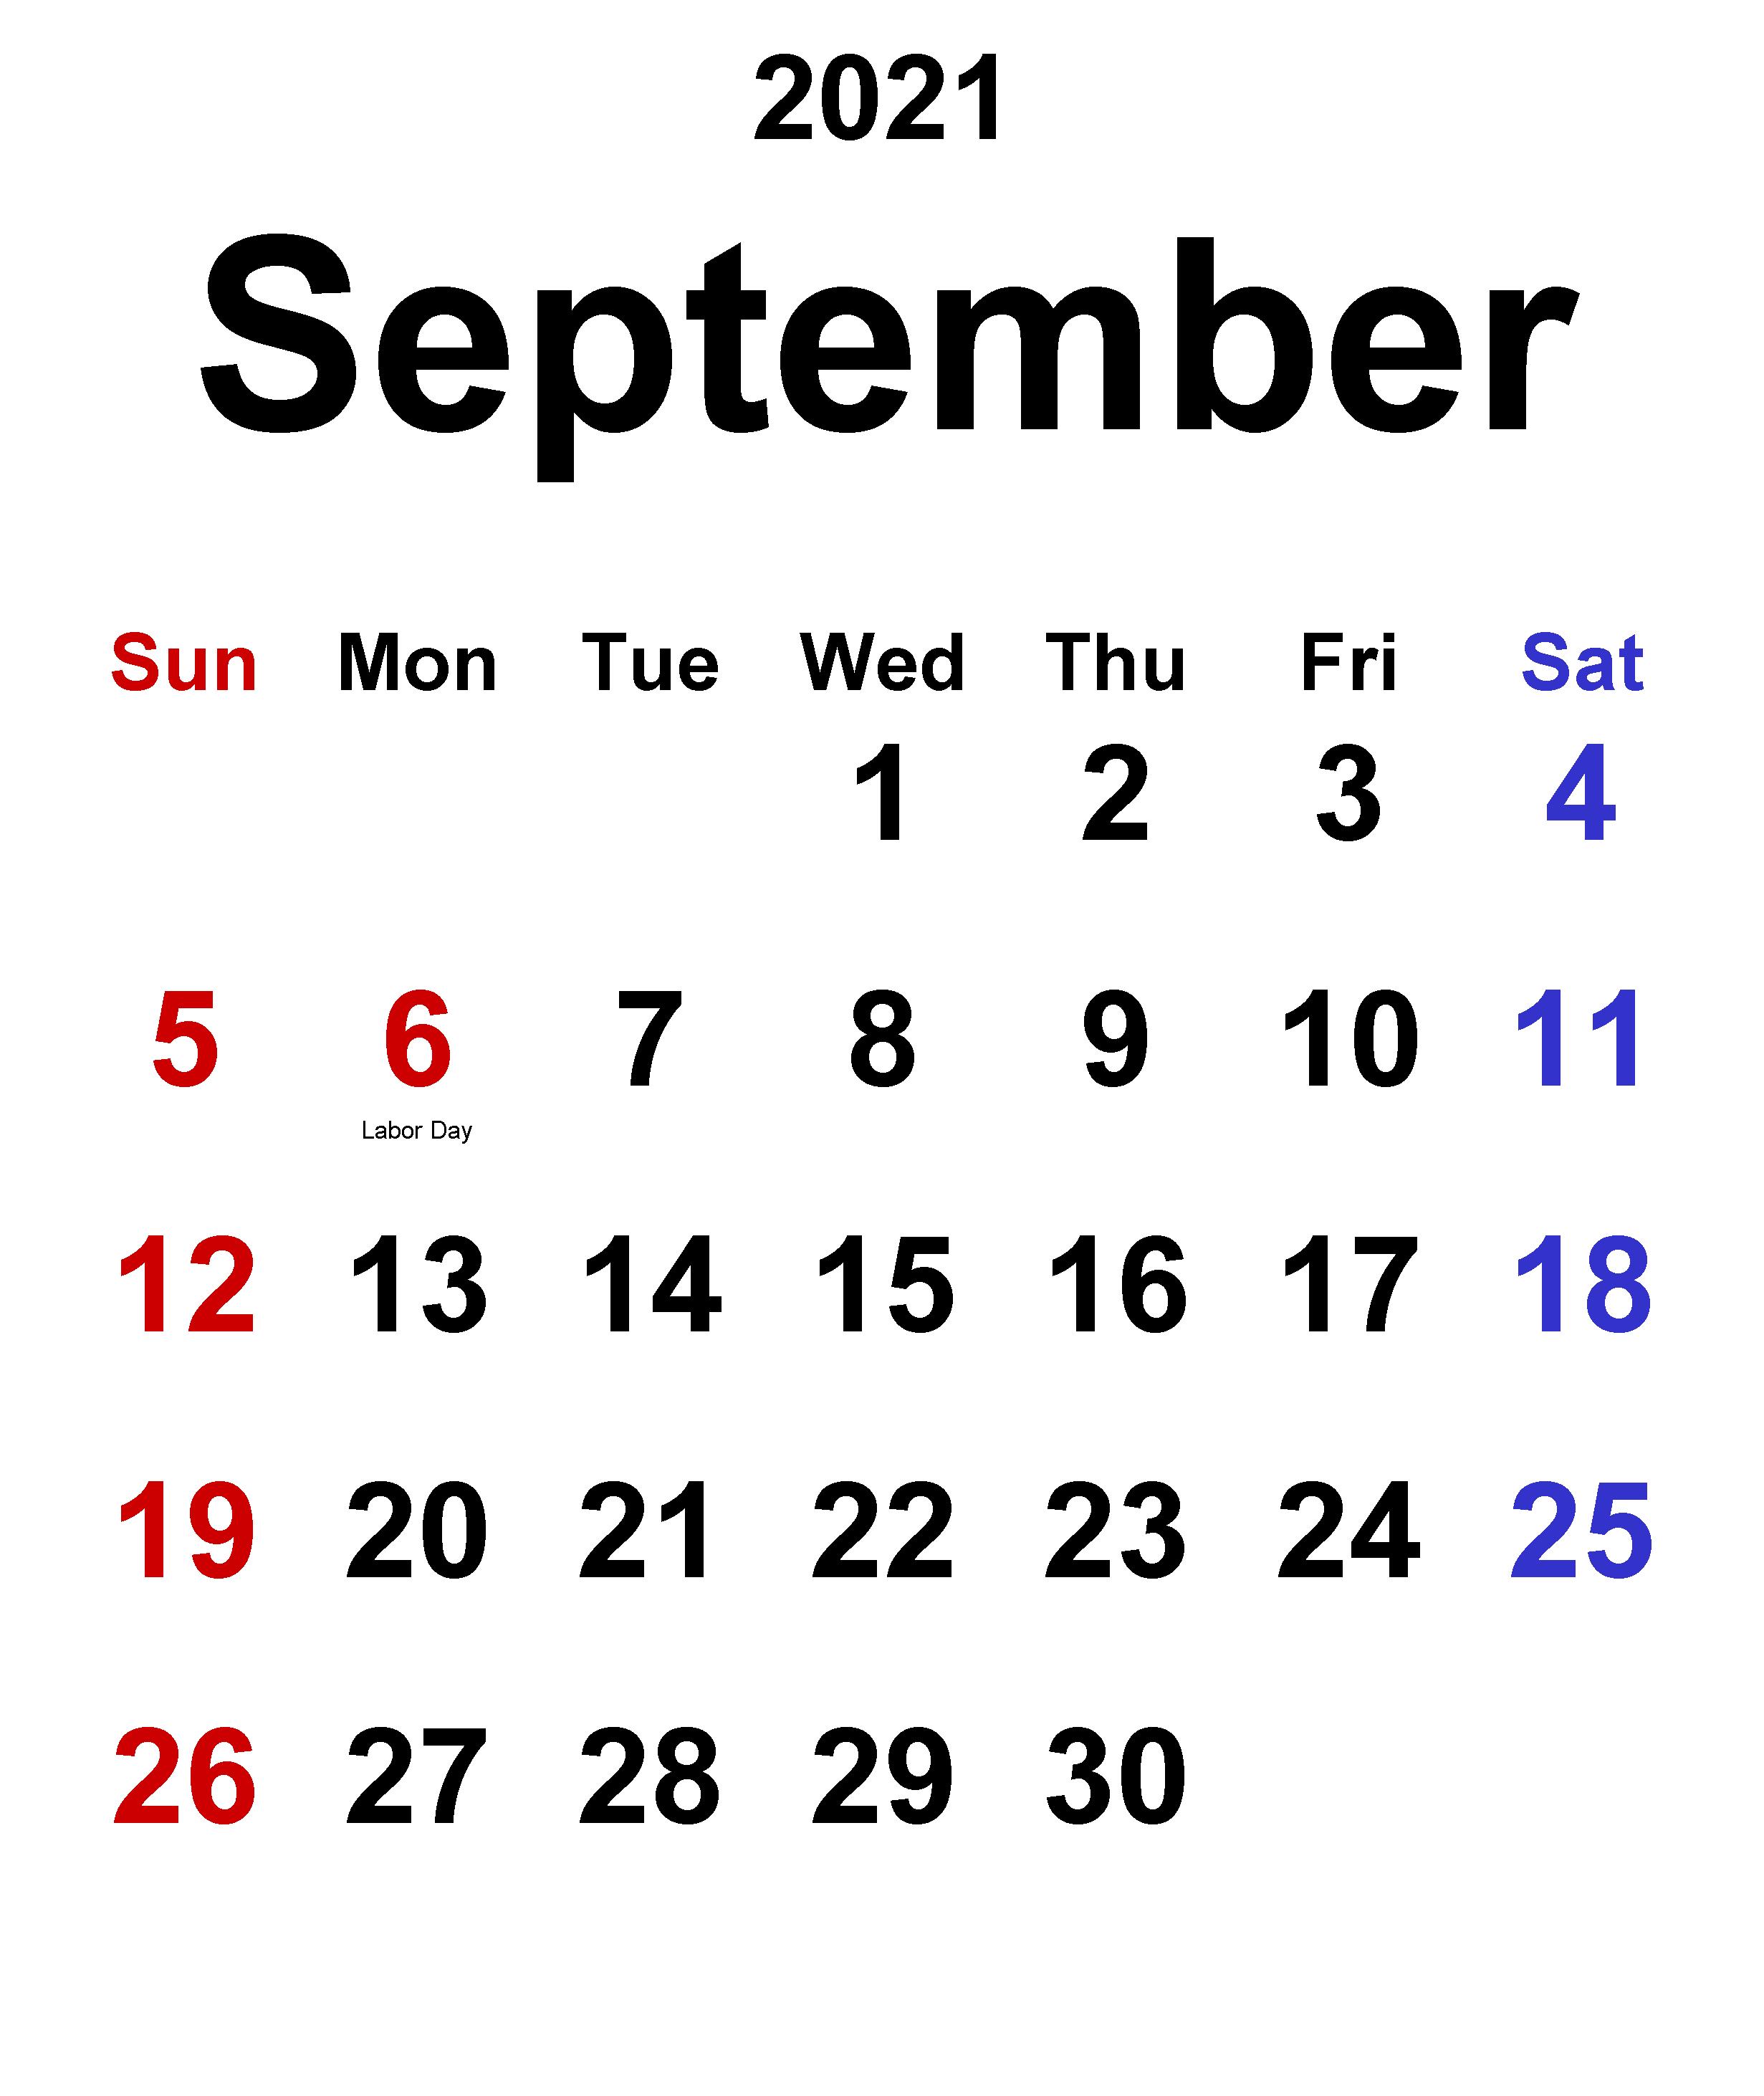 September 2021 classic calendar